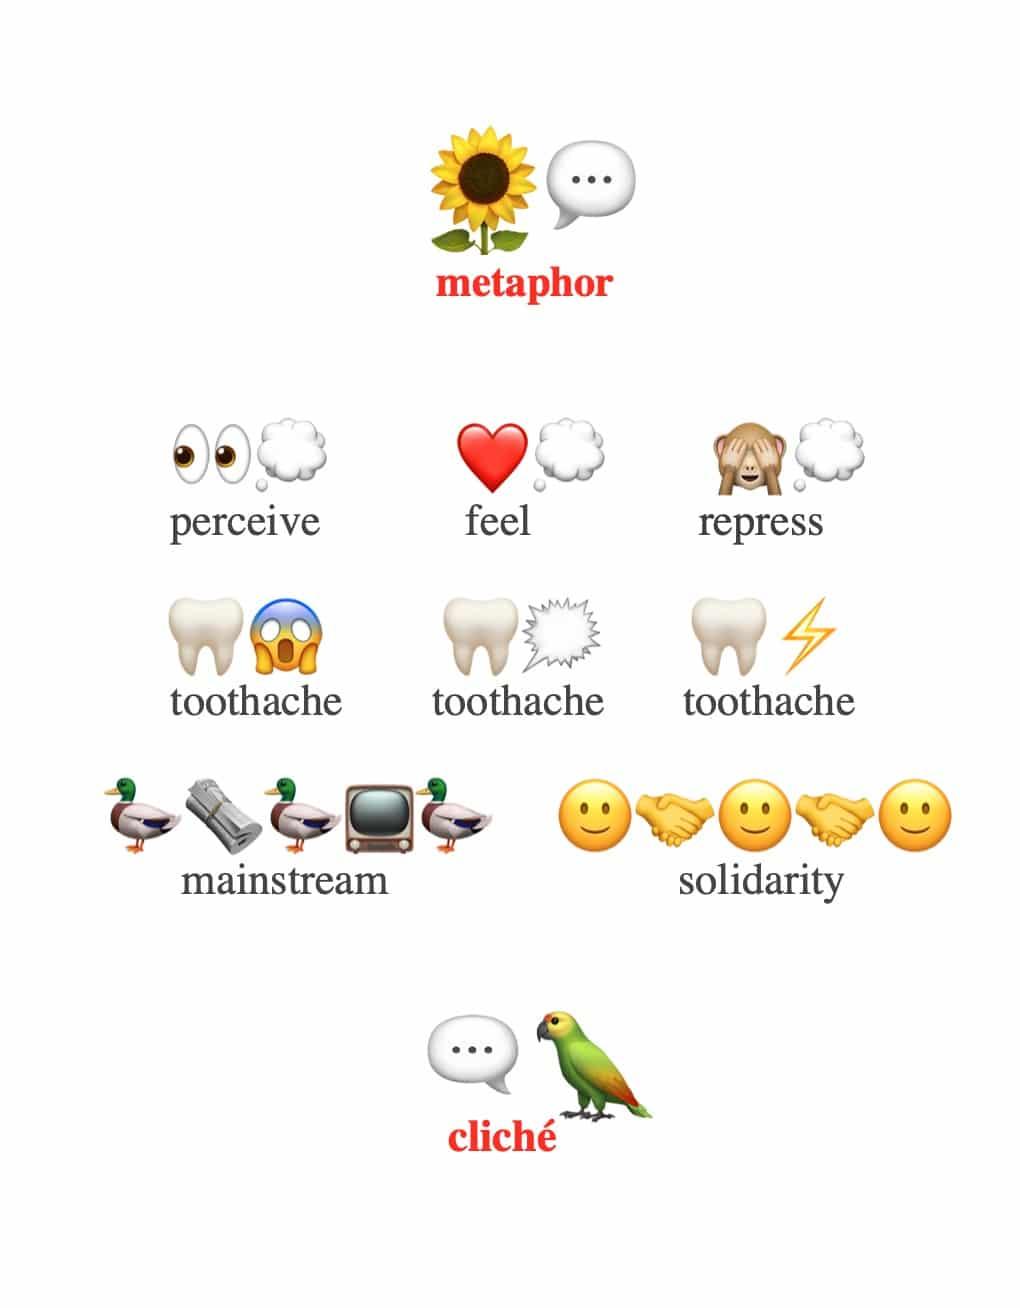 EmojiMetapher